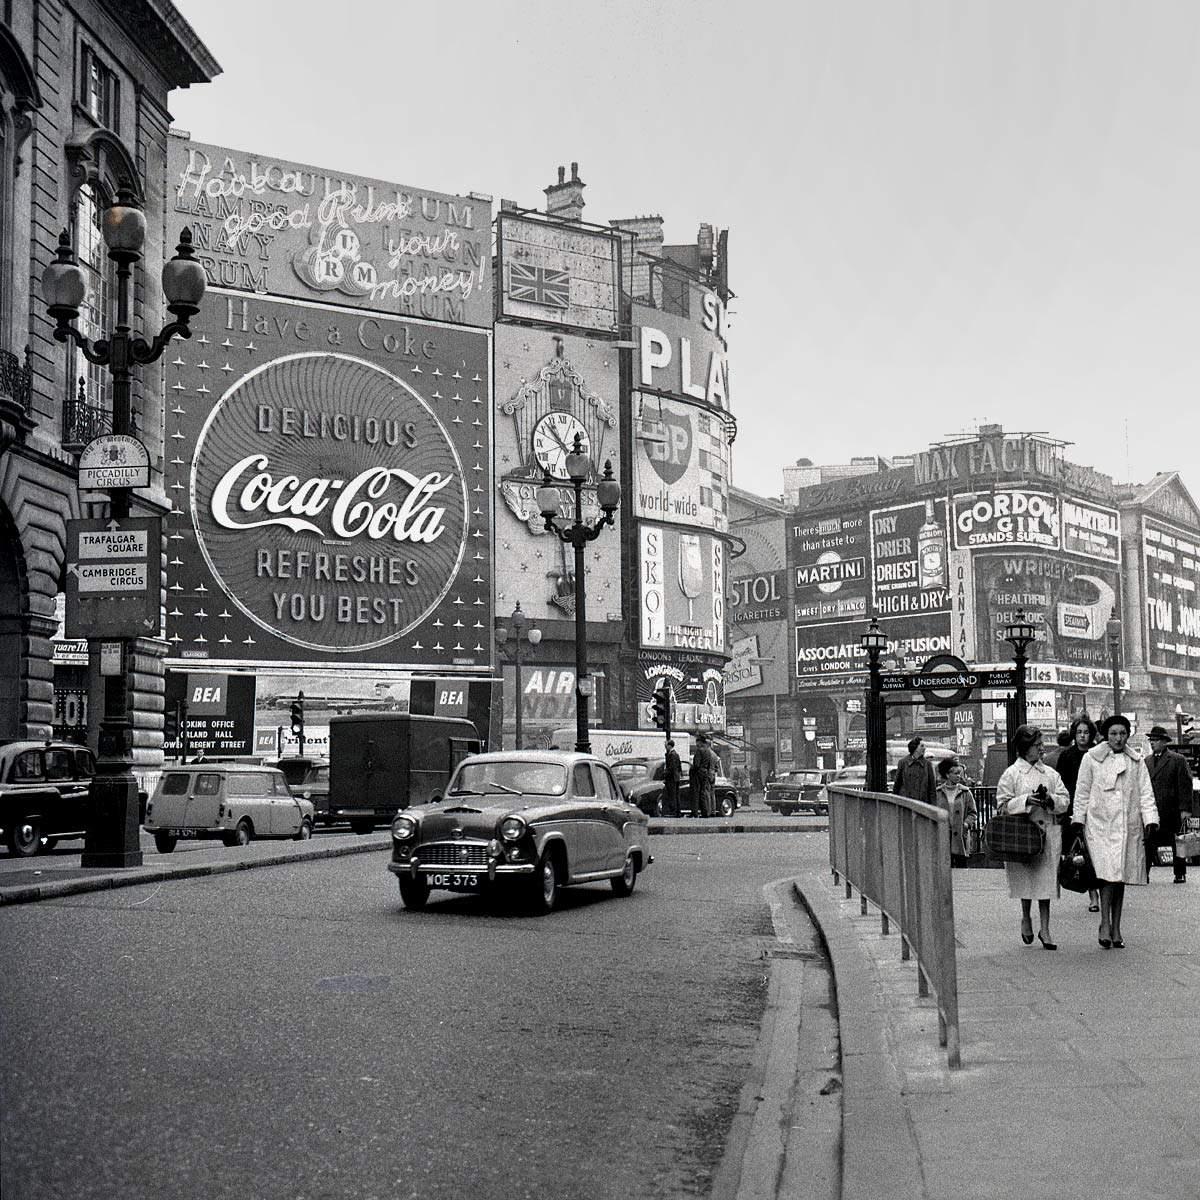 Piccadilly Circus, London, circa 1960